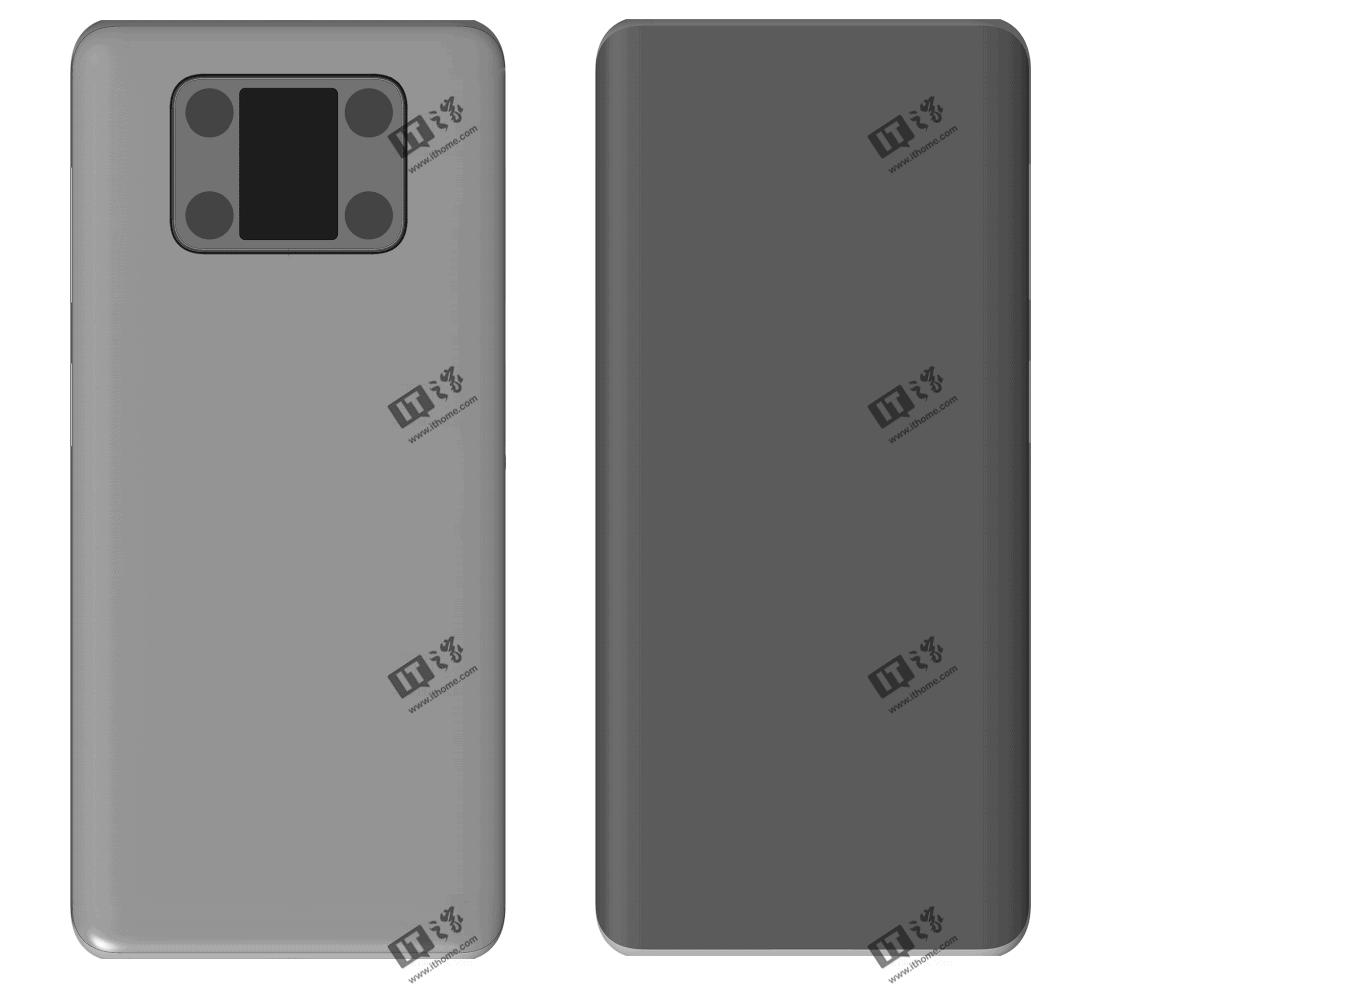 new huawei smartphone patent